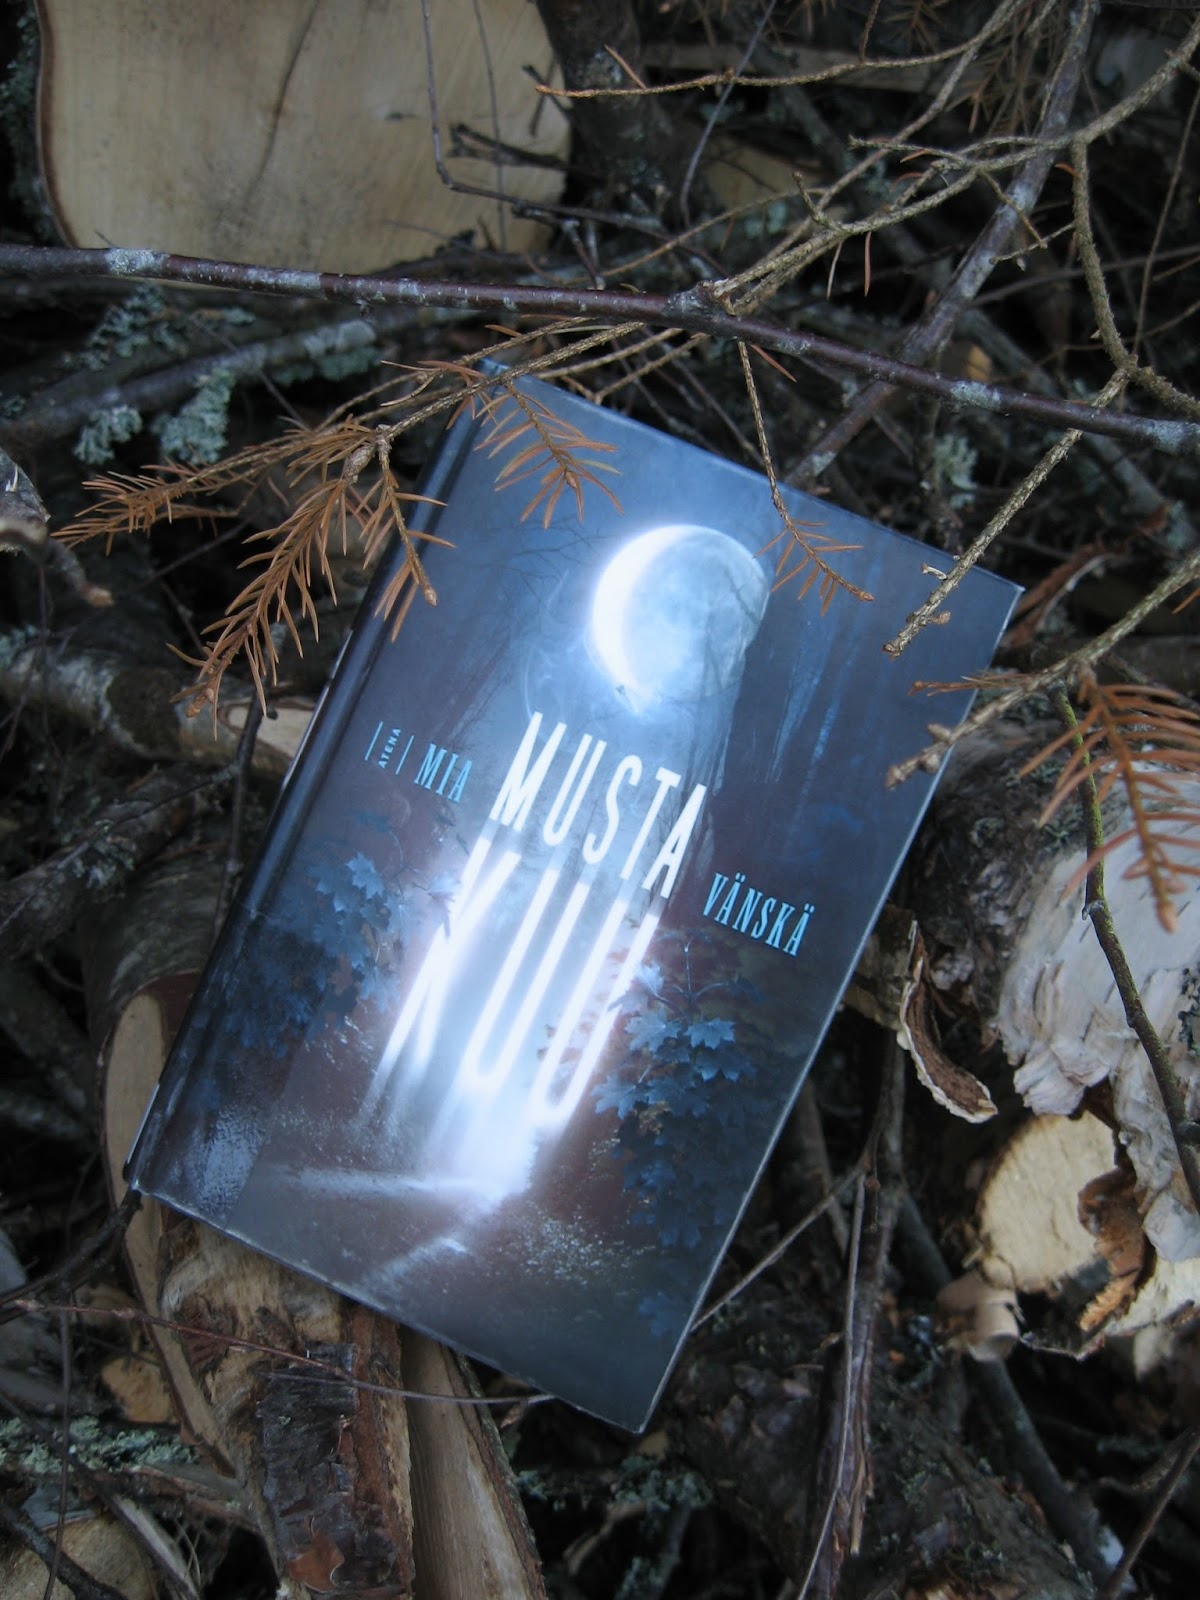 Musta Kassi Kuu : There s no such thing as too many books musta kuu mia v?nsk?